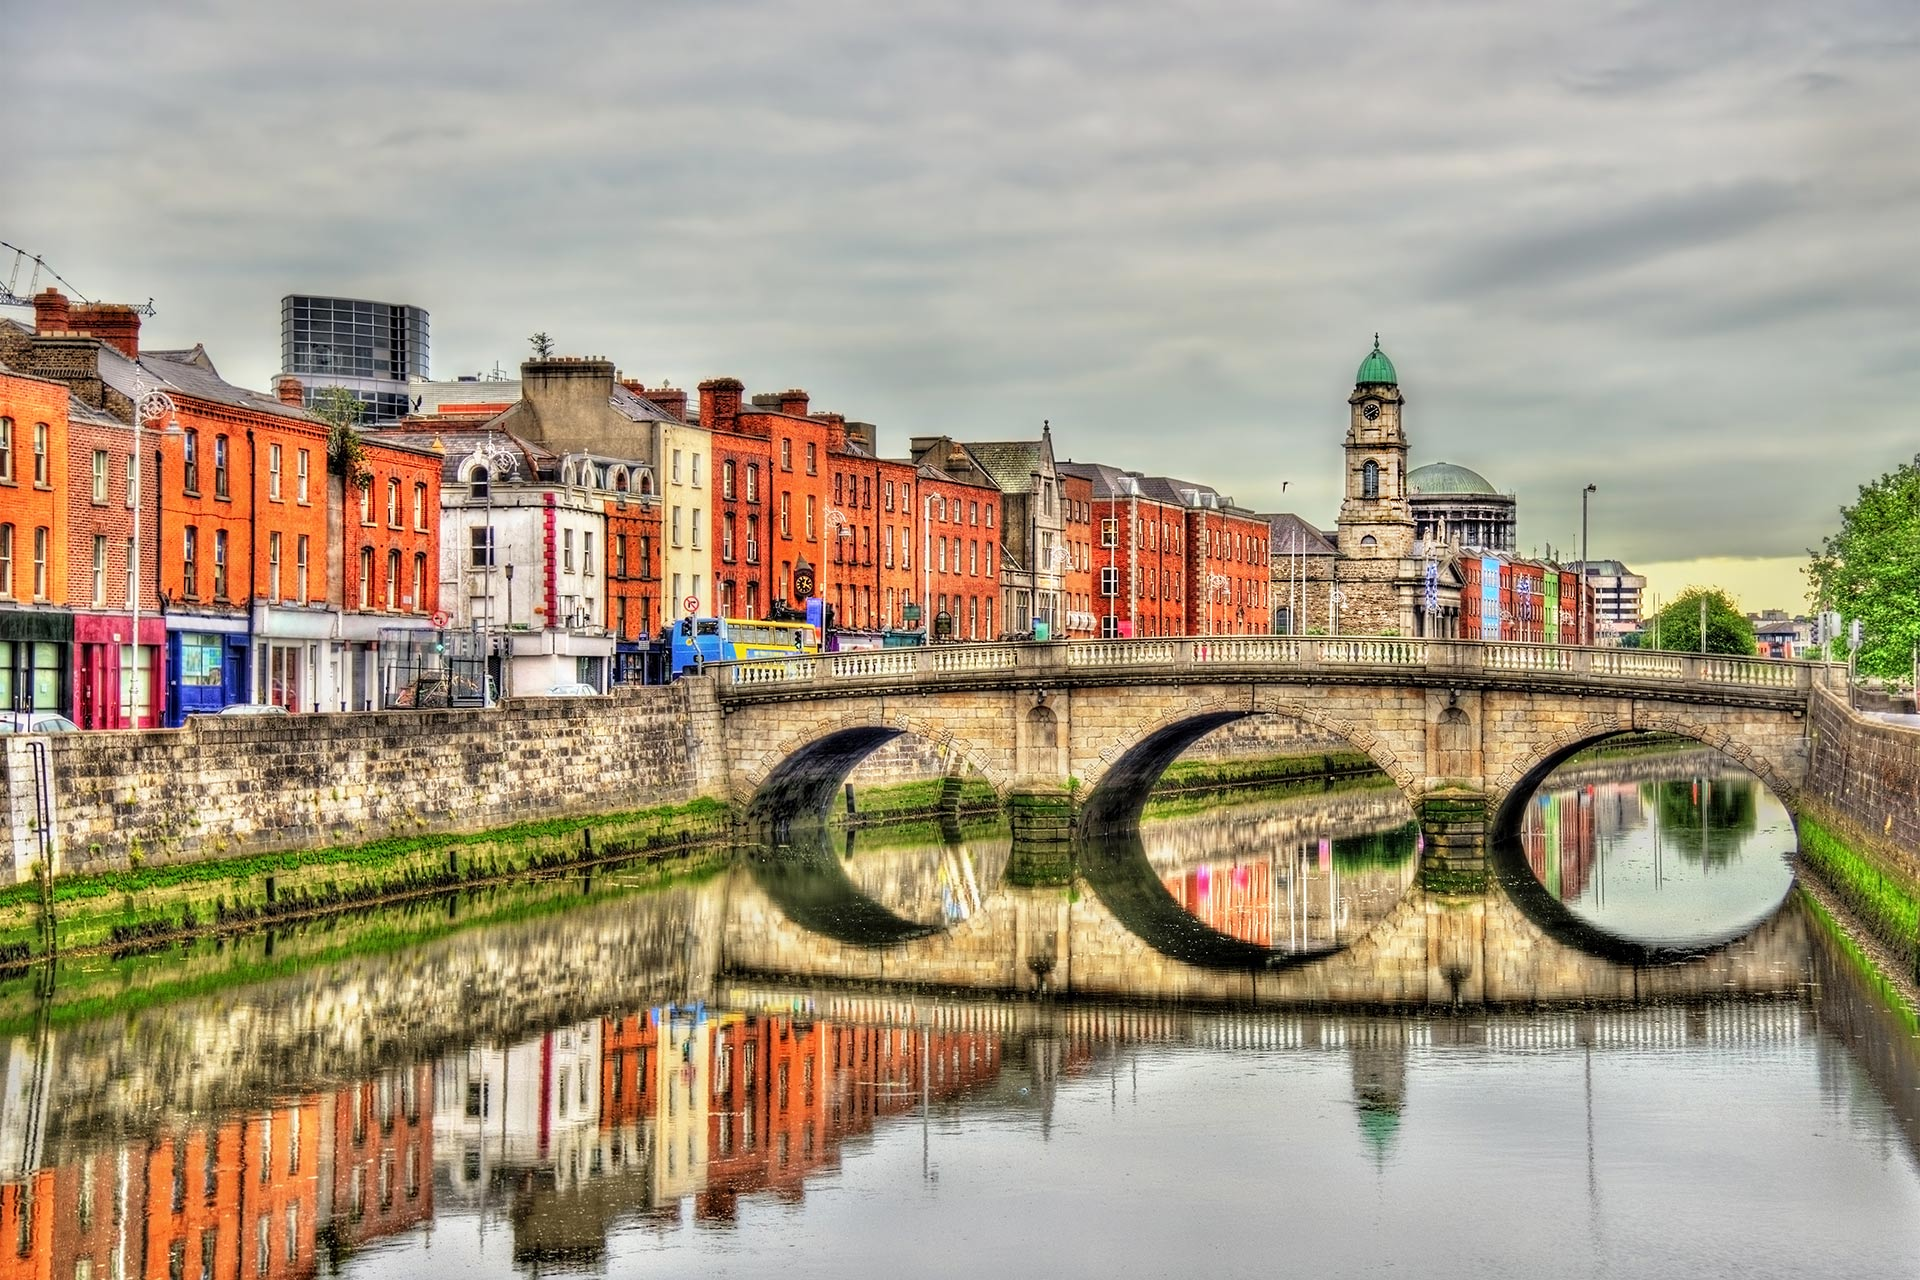 Mellows Bridge in Dublin, Ireland